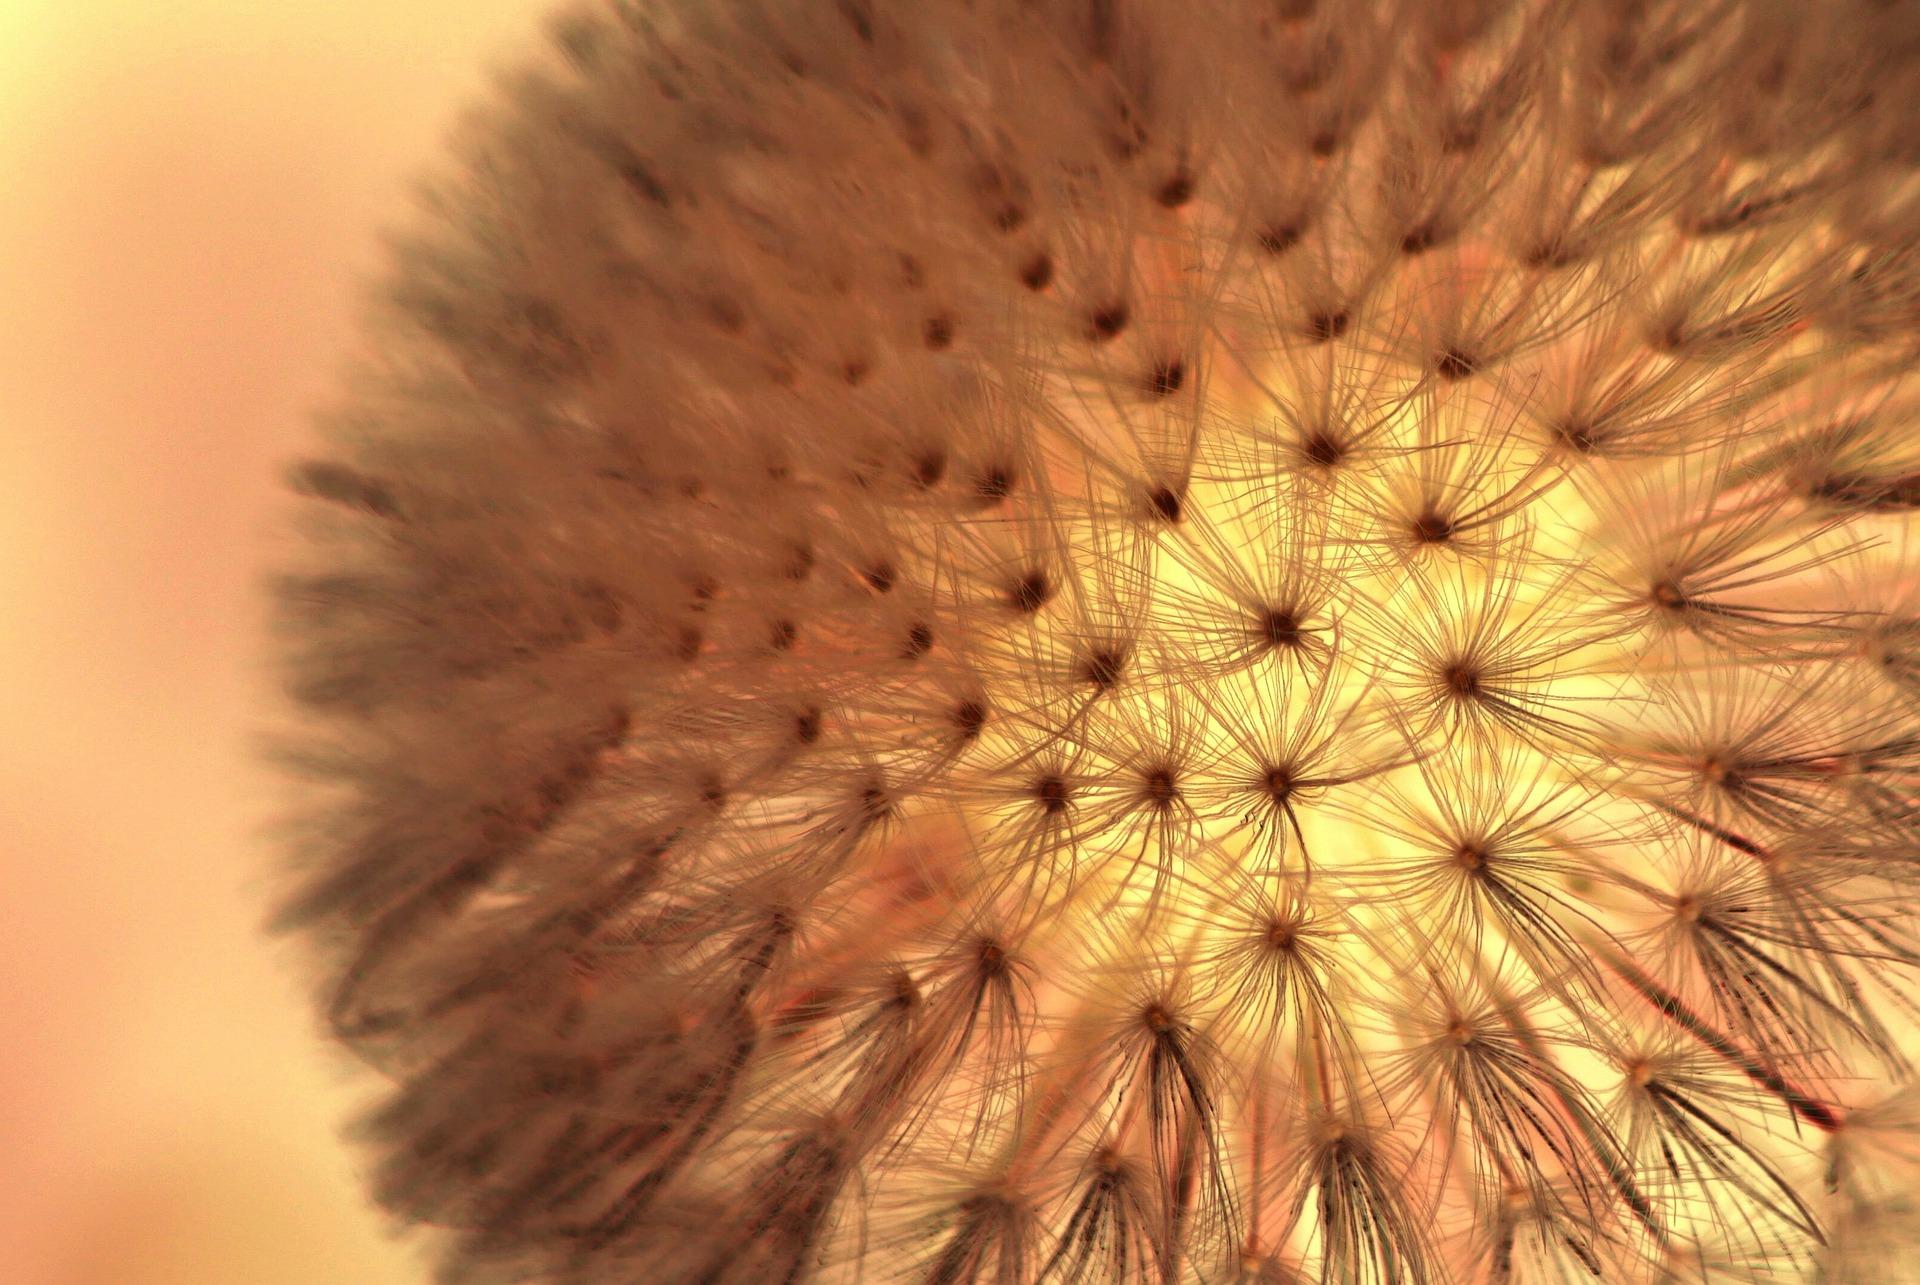 dandelion-302129_1920.jpg